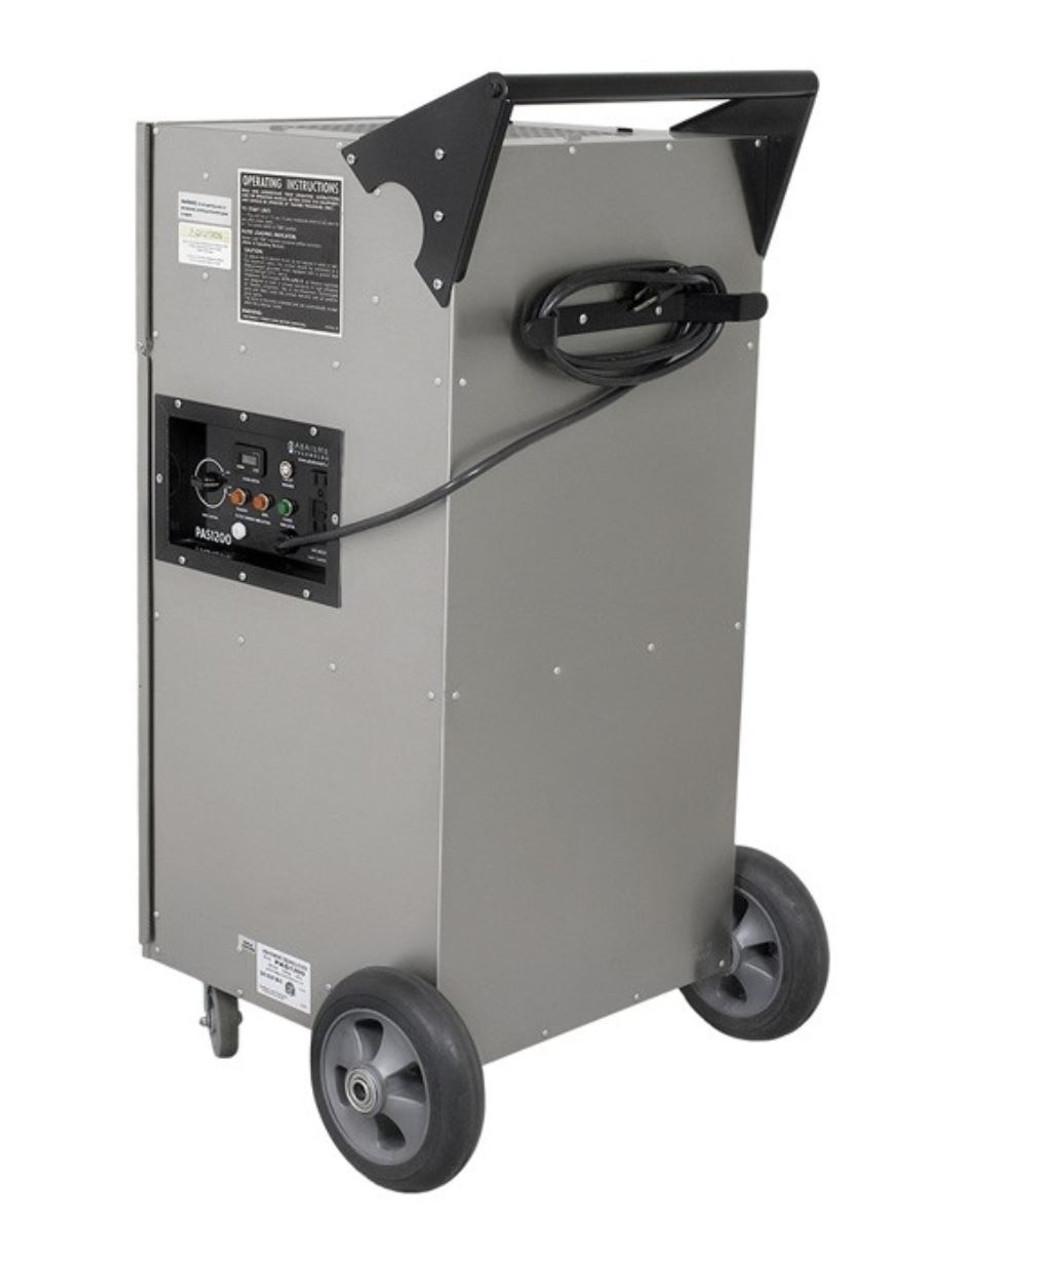 CAP600-UVP Abatement Technologies H610C-99 HEPA Filter for CAP600 CAP600-UV CAP1200